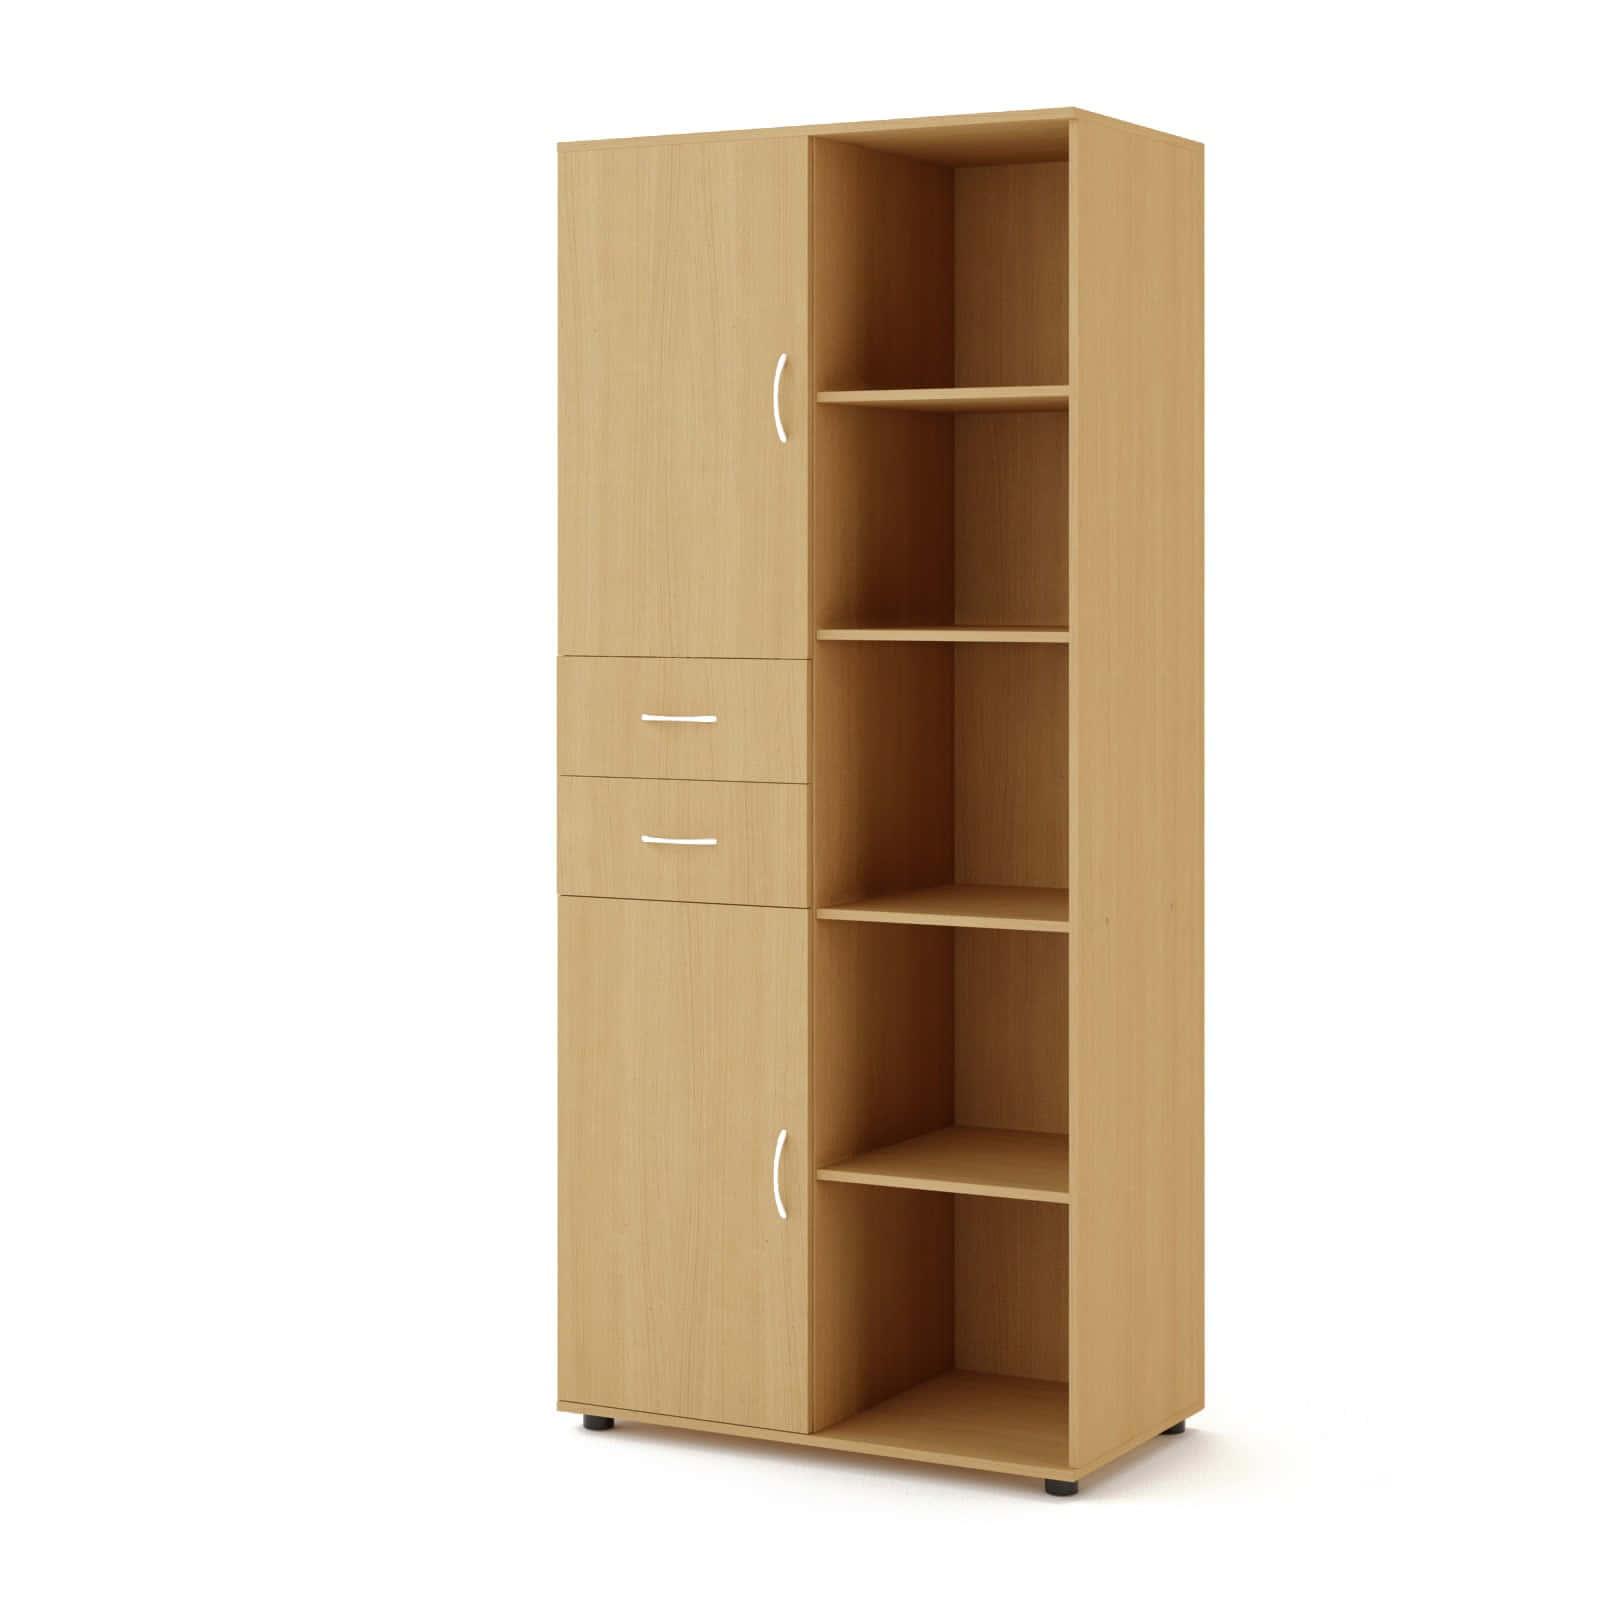 Шкафы корпусные распашные